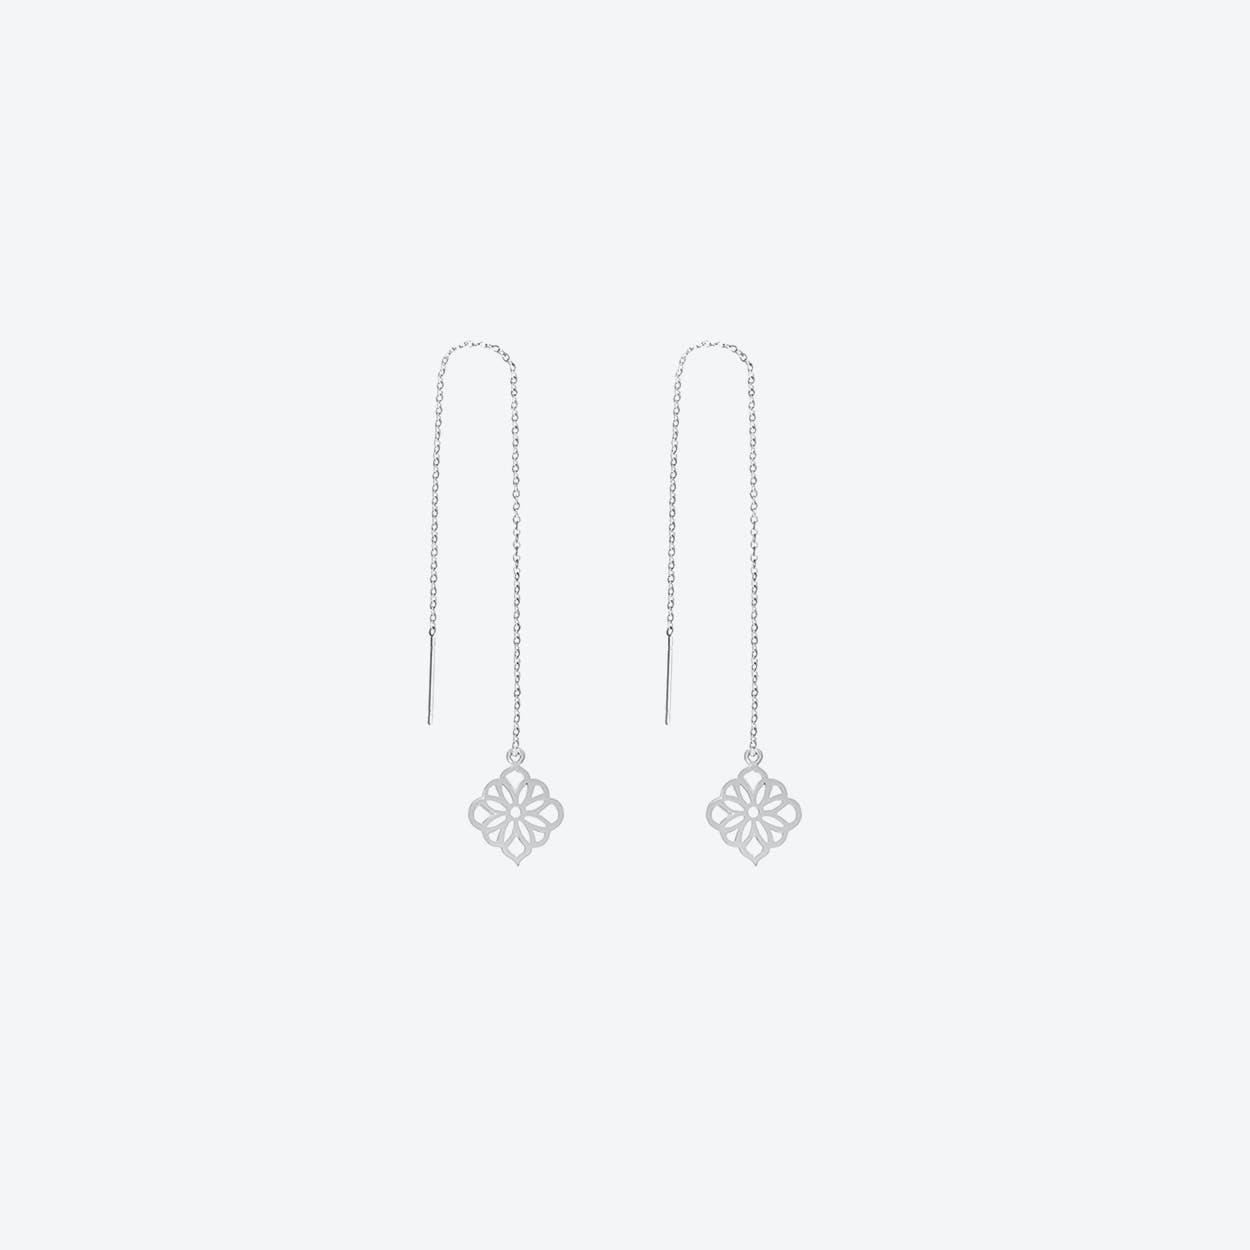 Persia Threader Earrings